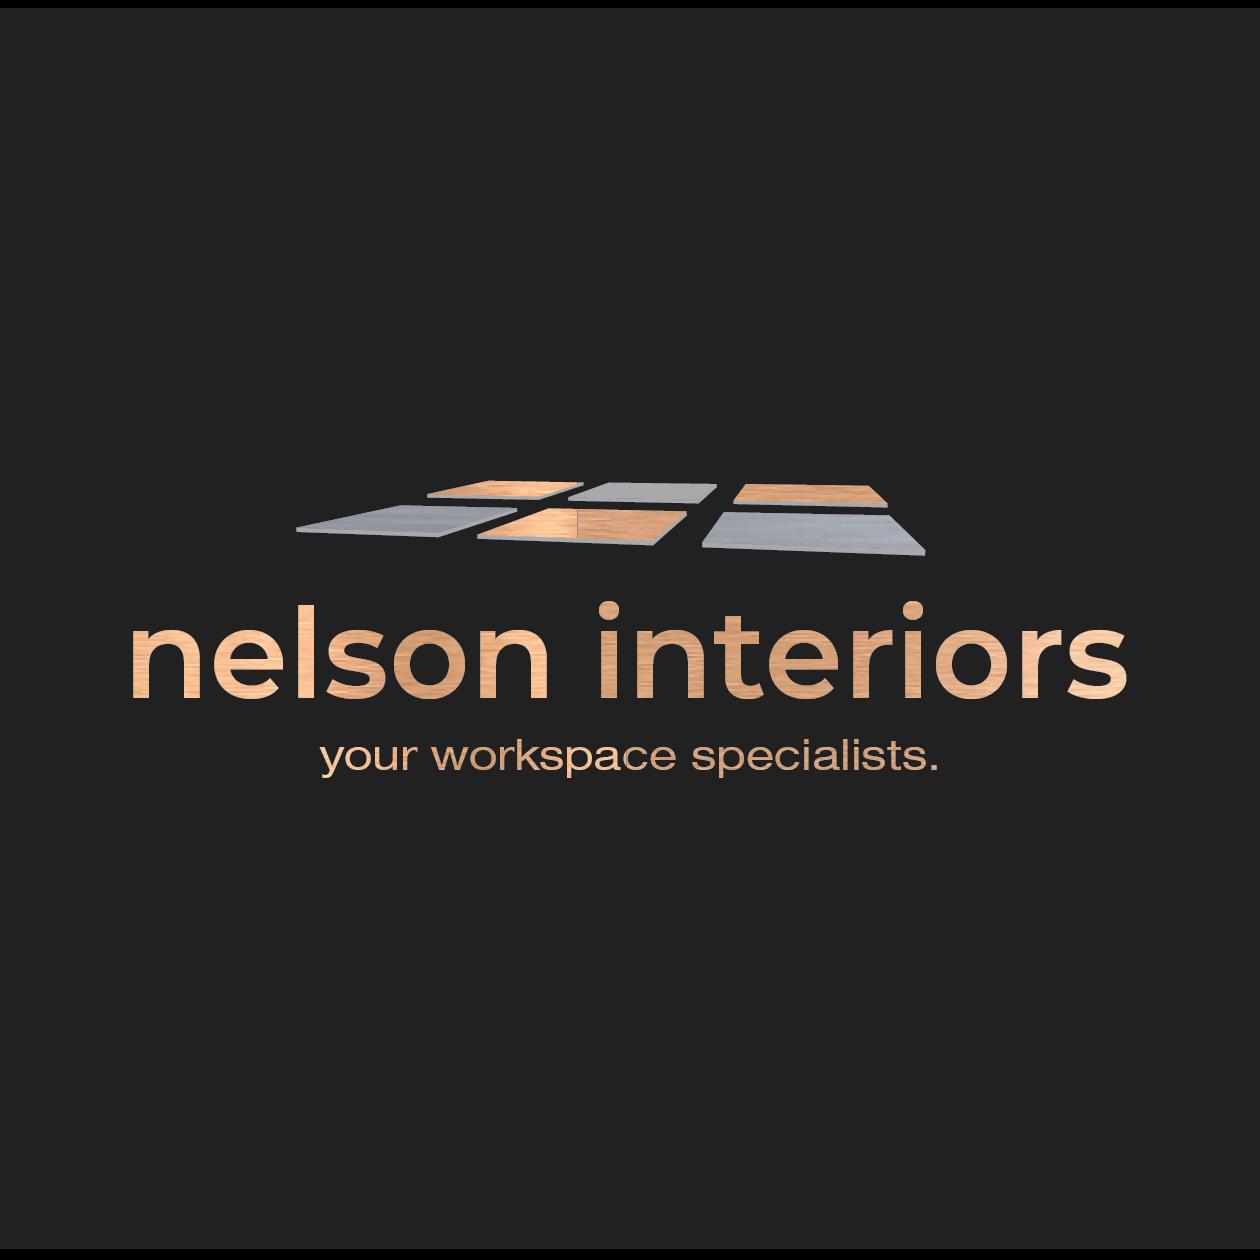 Nelson interiors